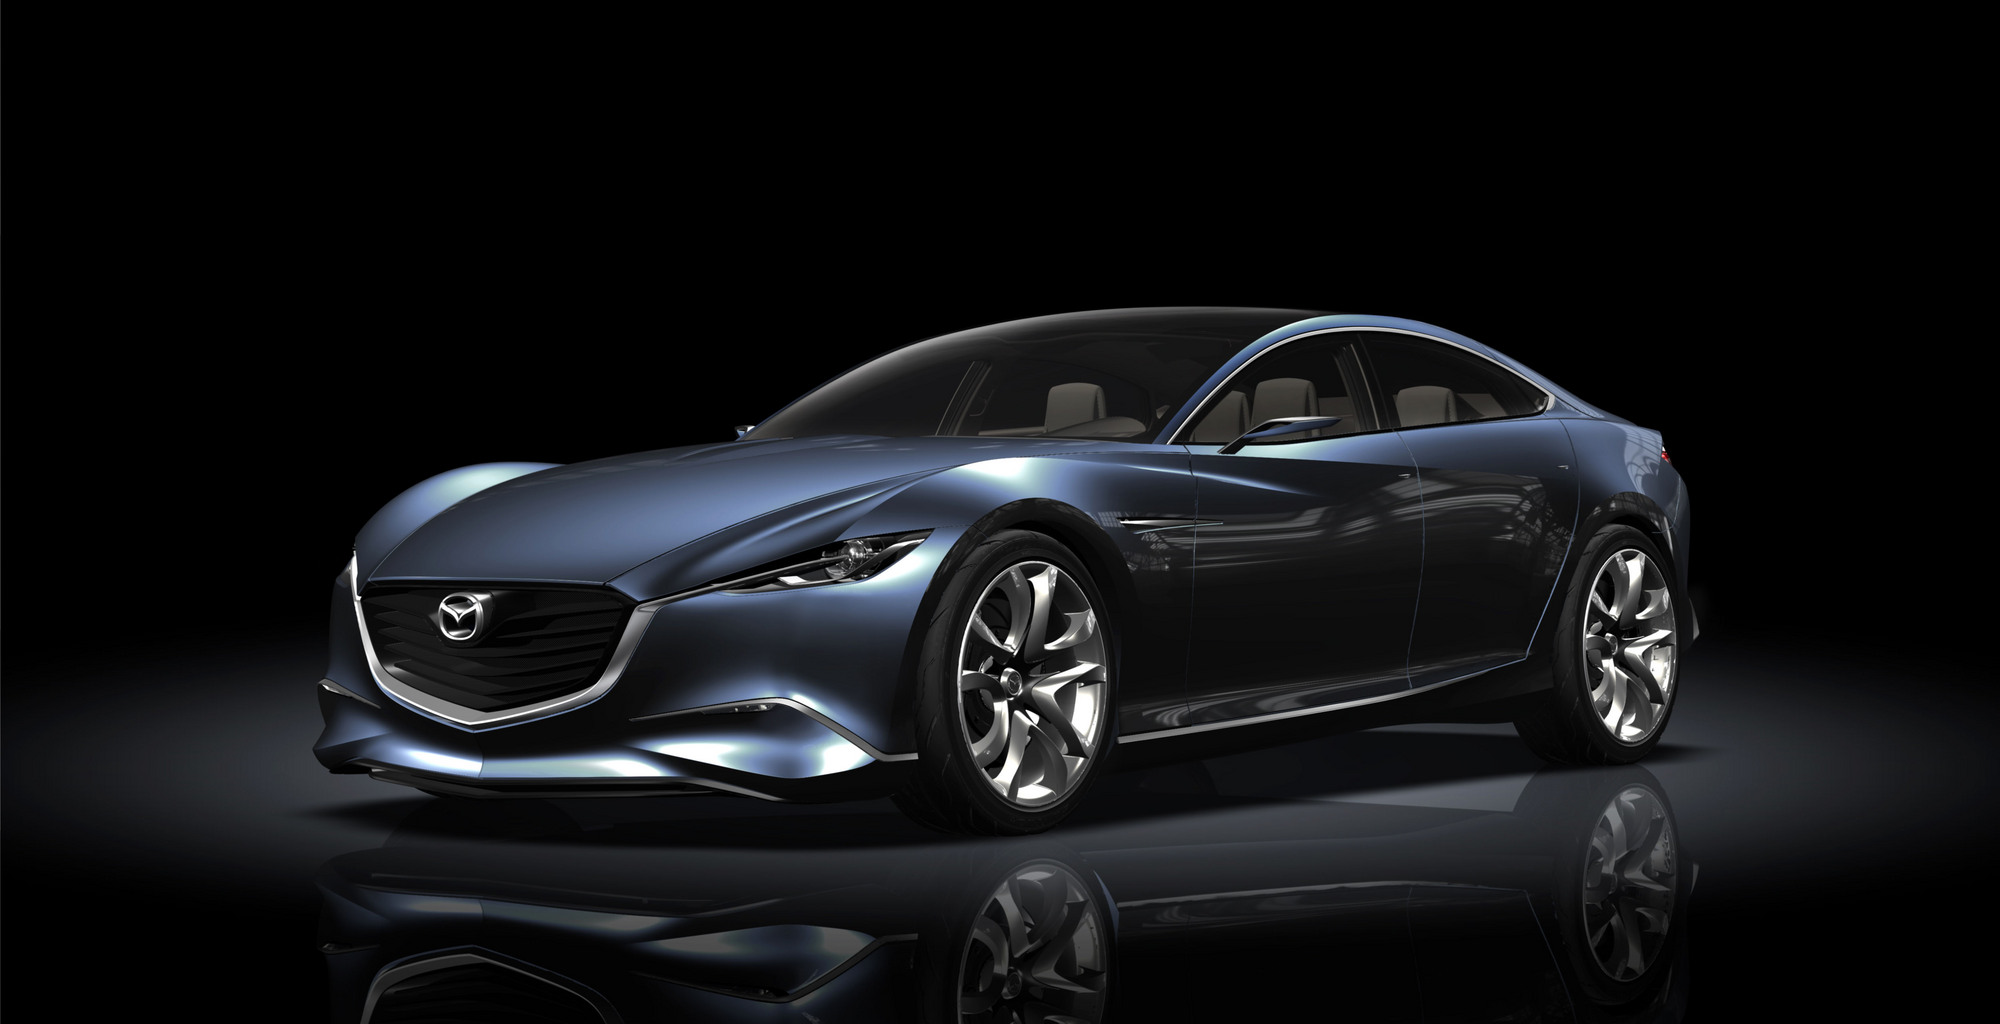 Mazda unveils its New Design Theme   KODO   Soul of Motion. Mazda unveils its New Design Theme   KODO   Soul of Motion